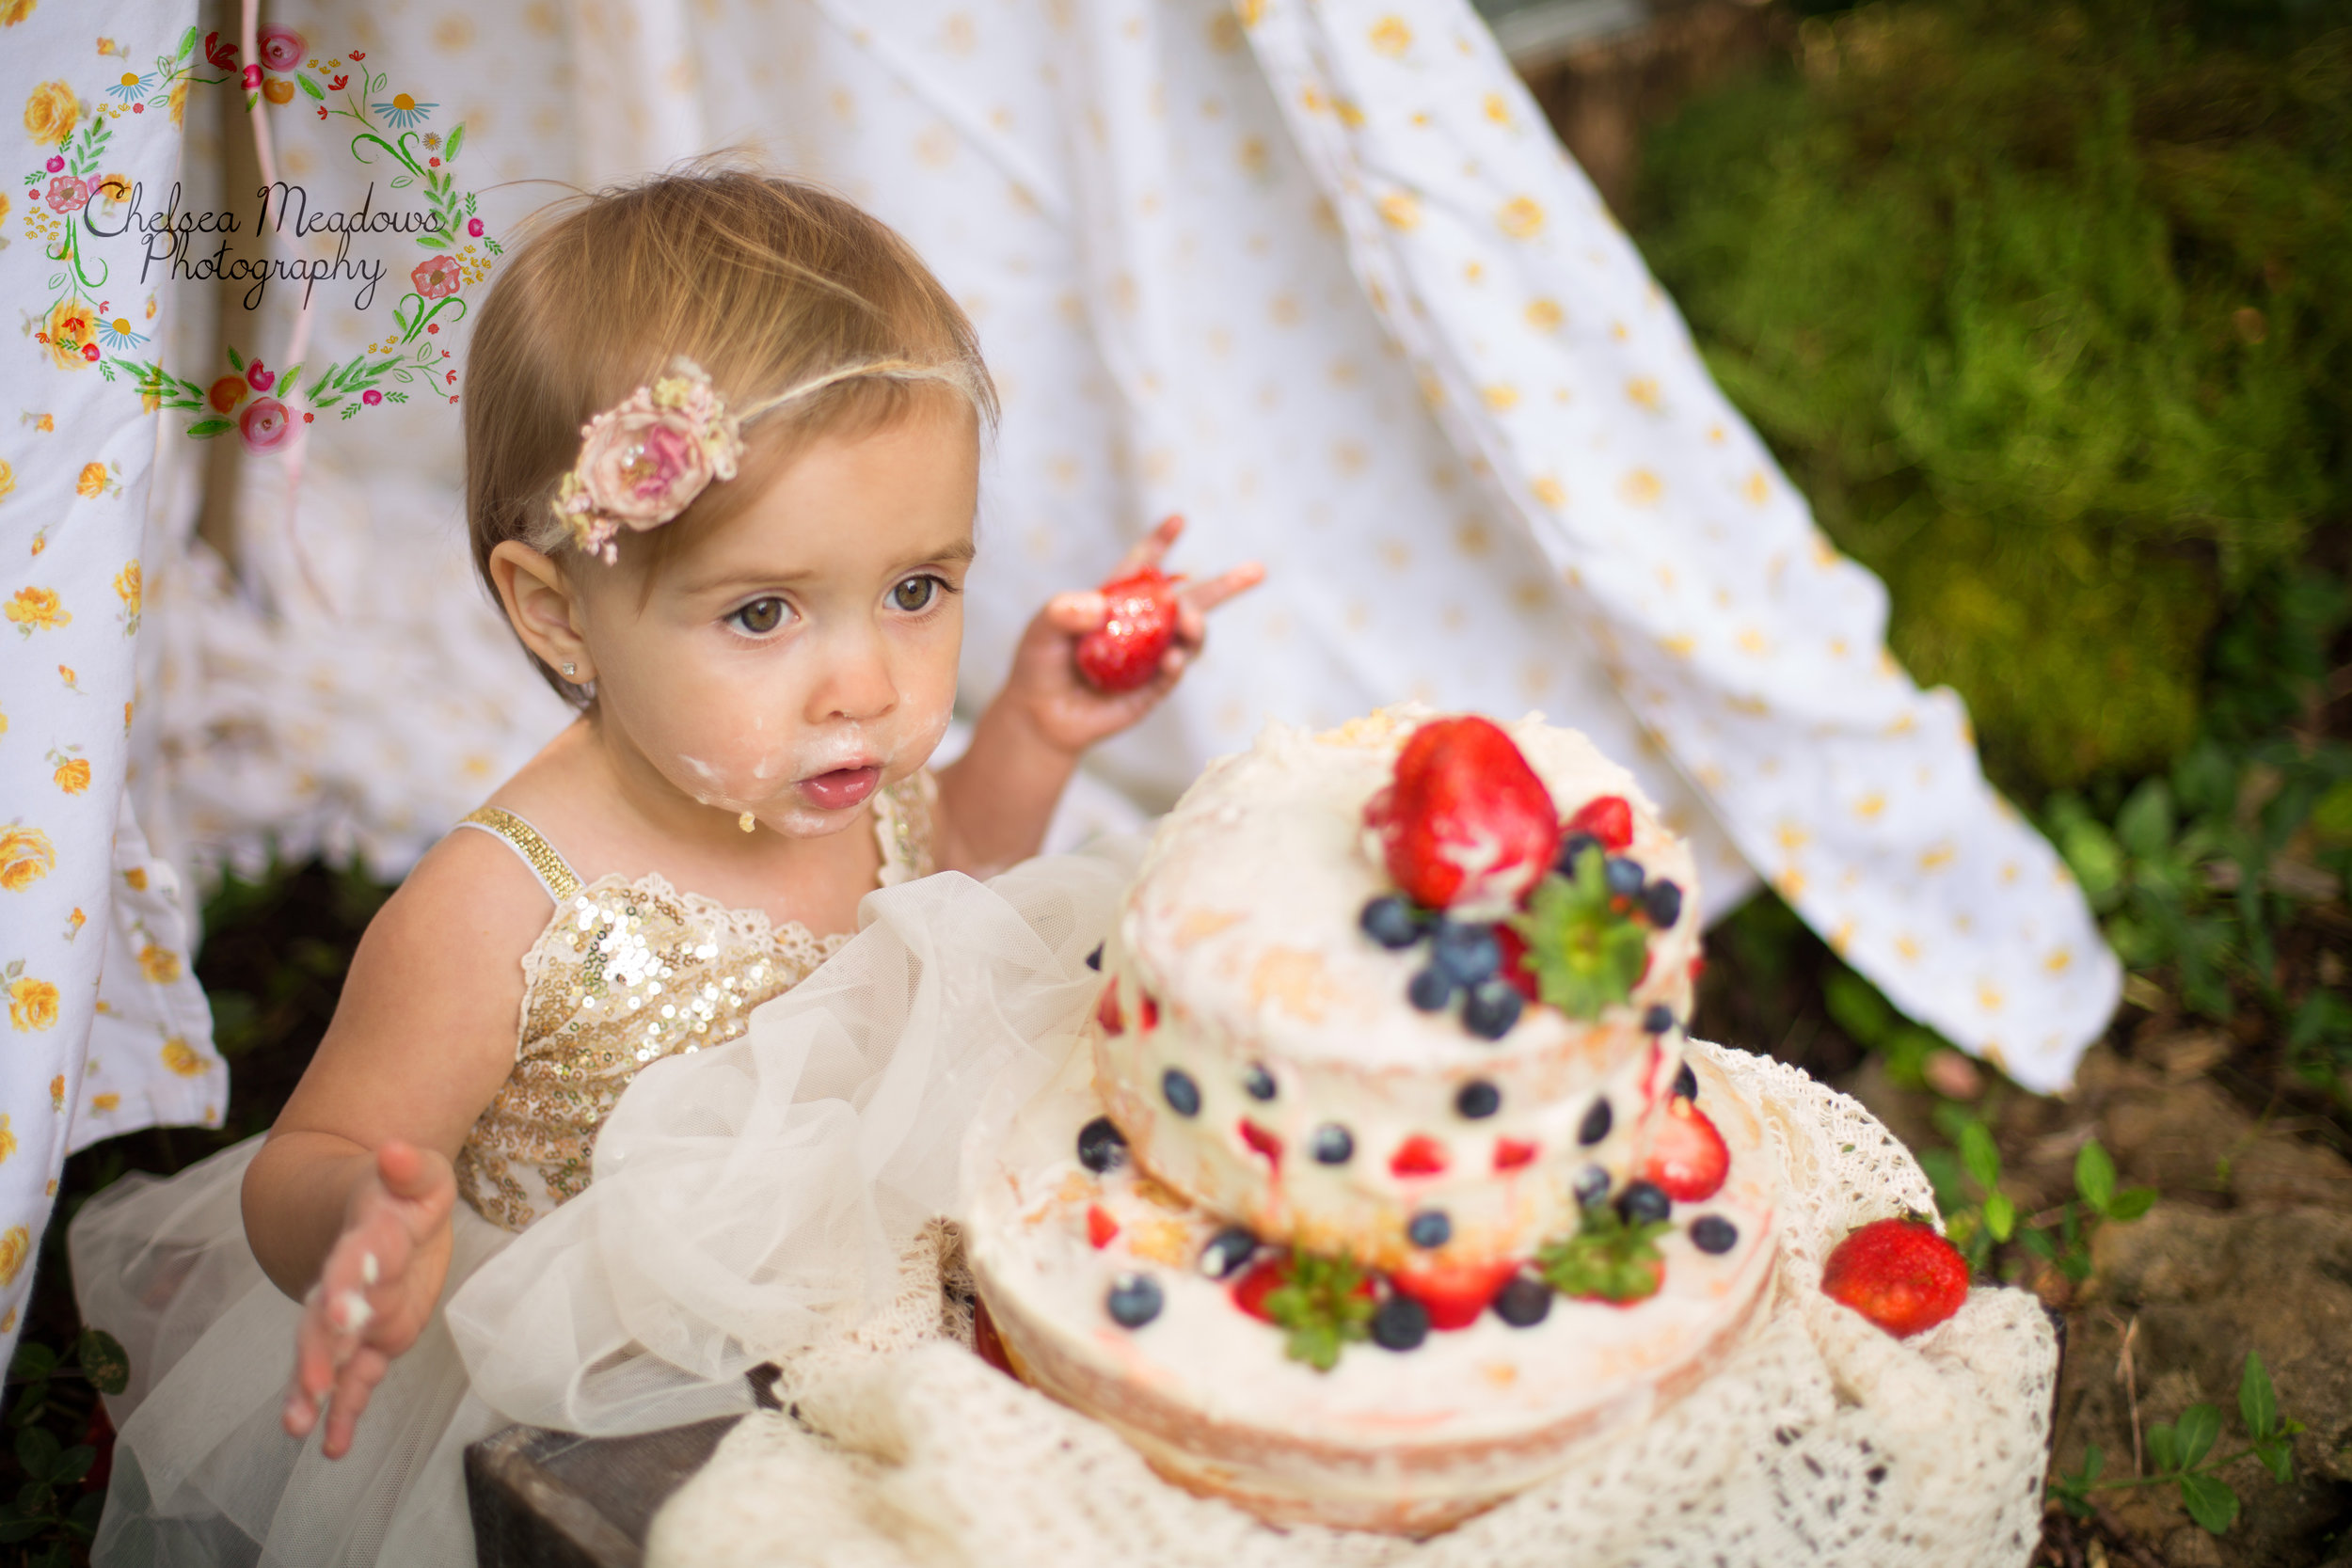 Paisley First Birthay Cake Smash - Nashville Family Photographer - Chelsea Meadows Photography (4).jpg